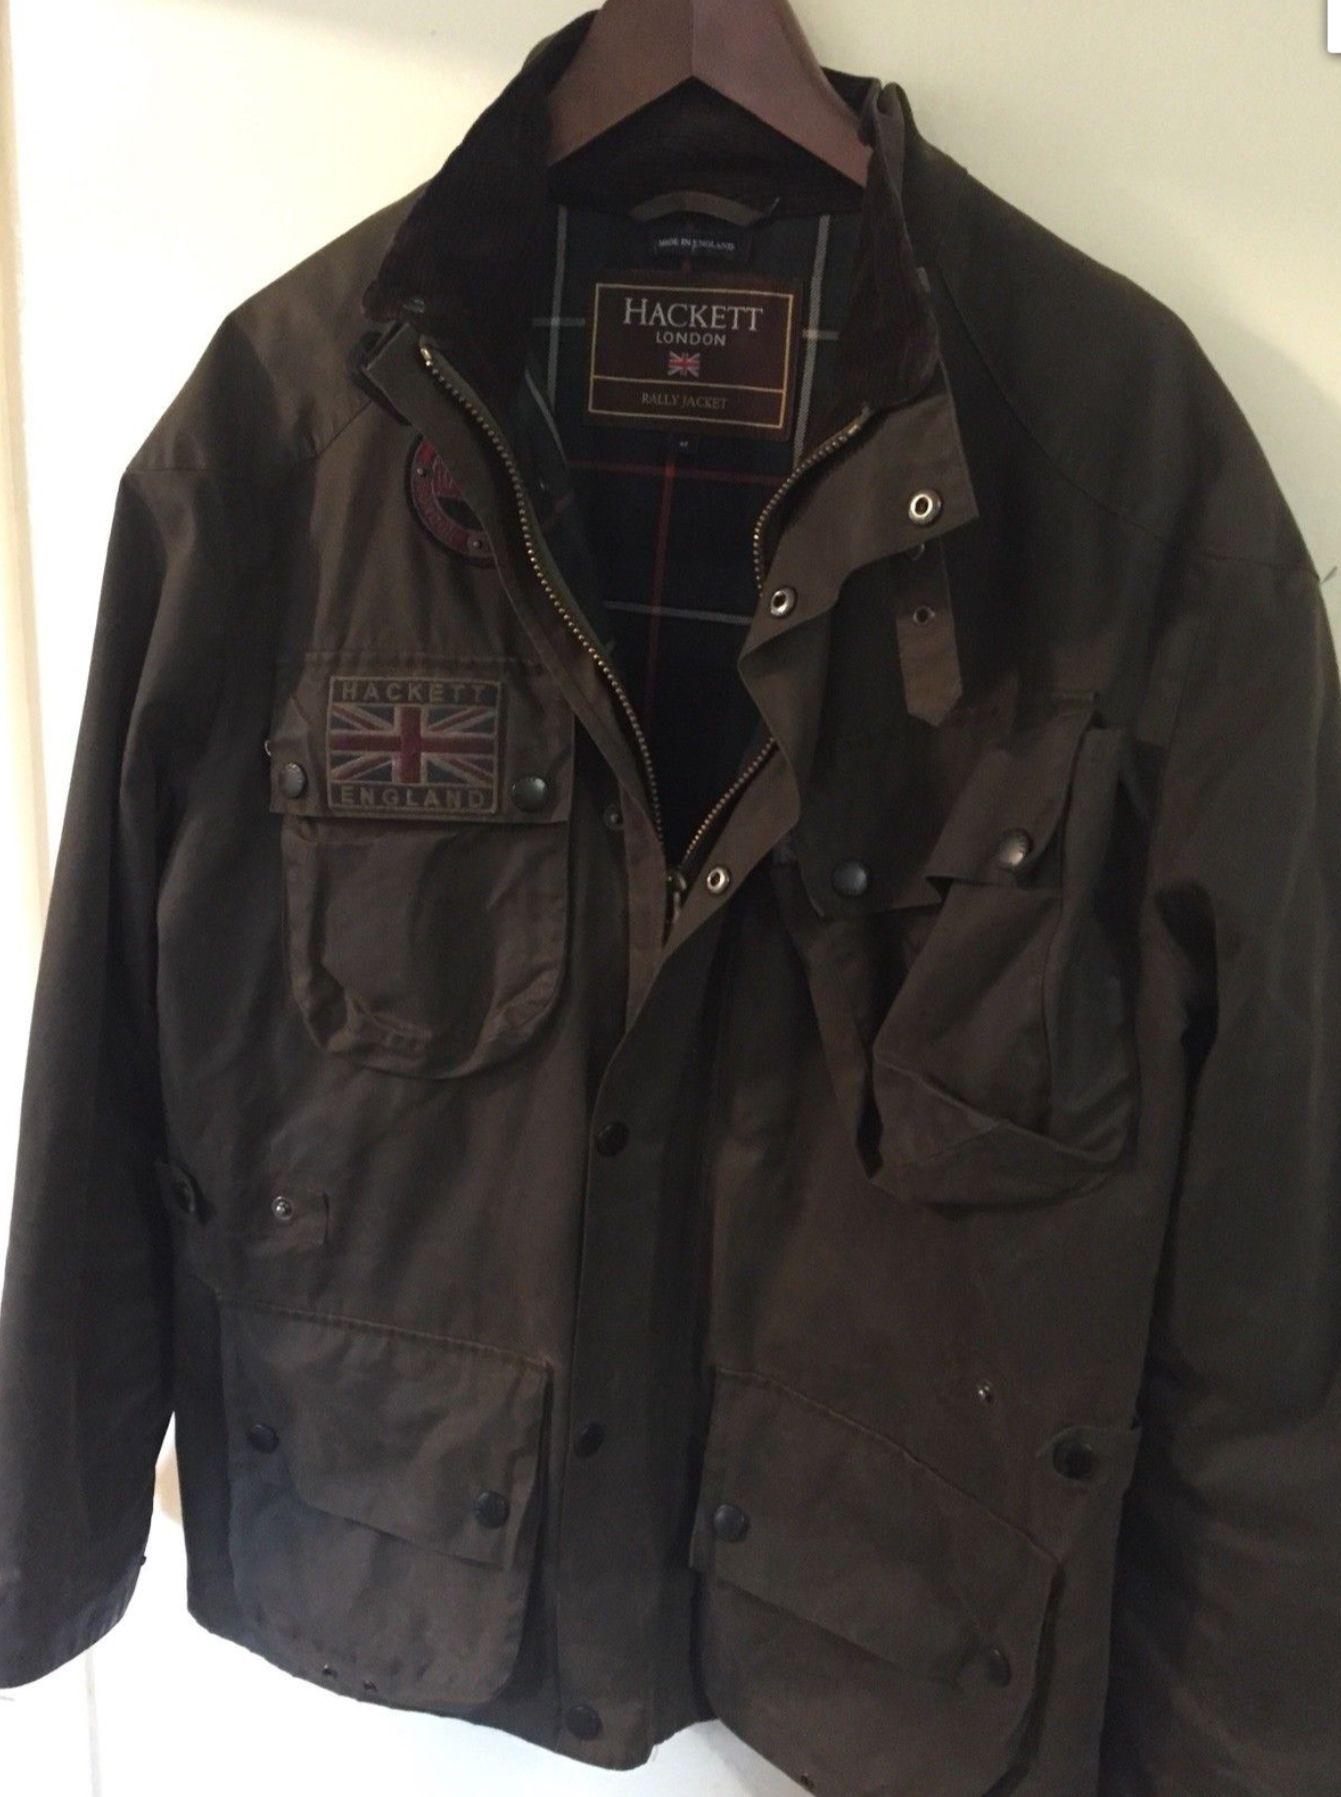 102b28087fecd Barbour/Hackett   Gentleman Dress   Jackets, Barbour, Fashion